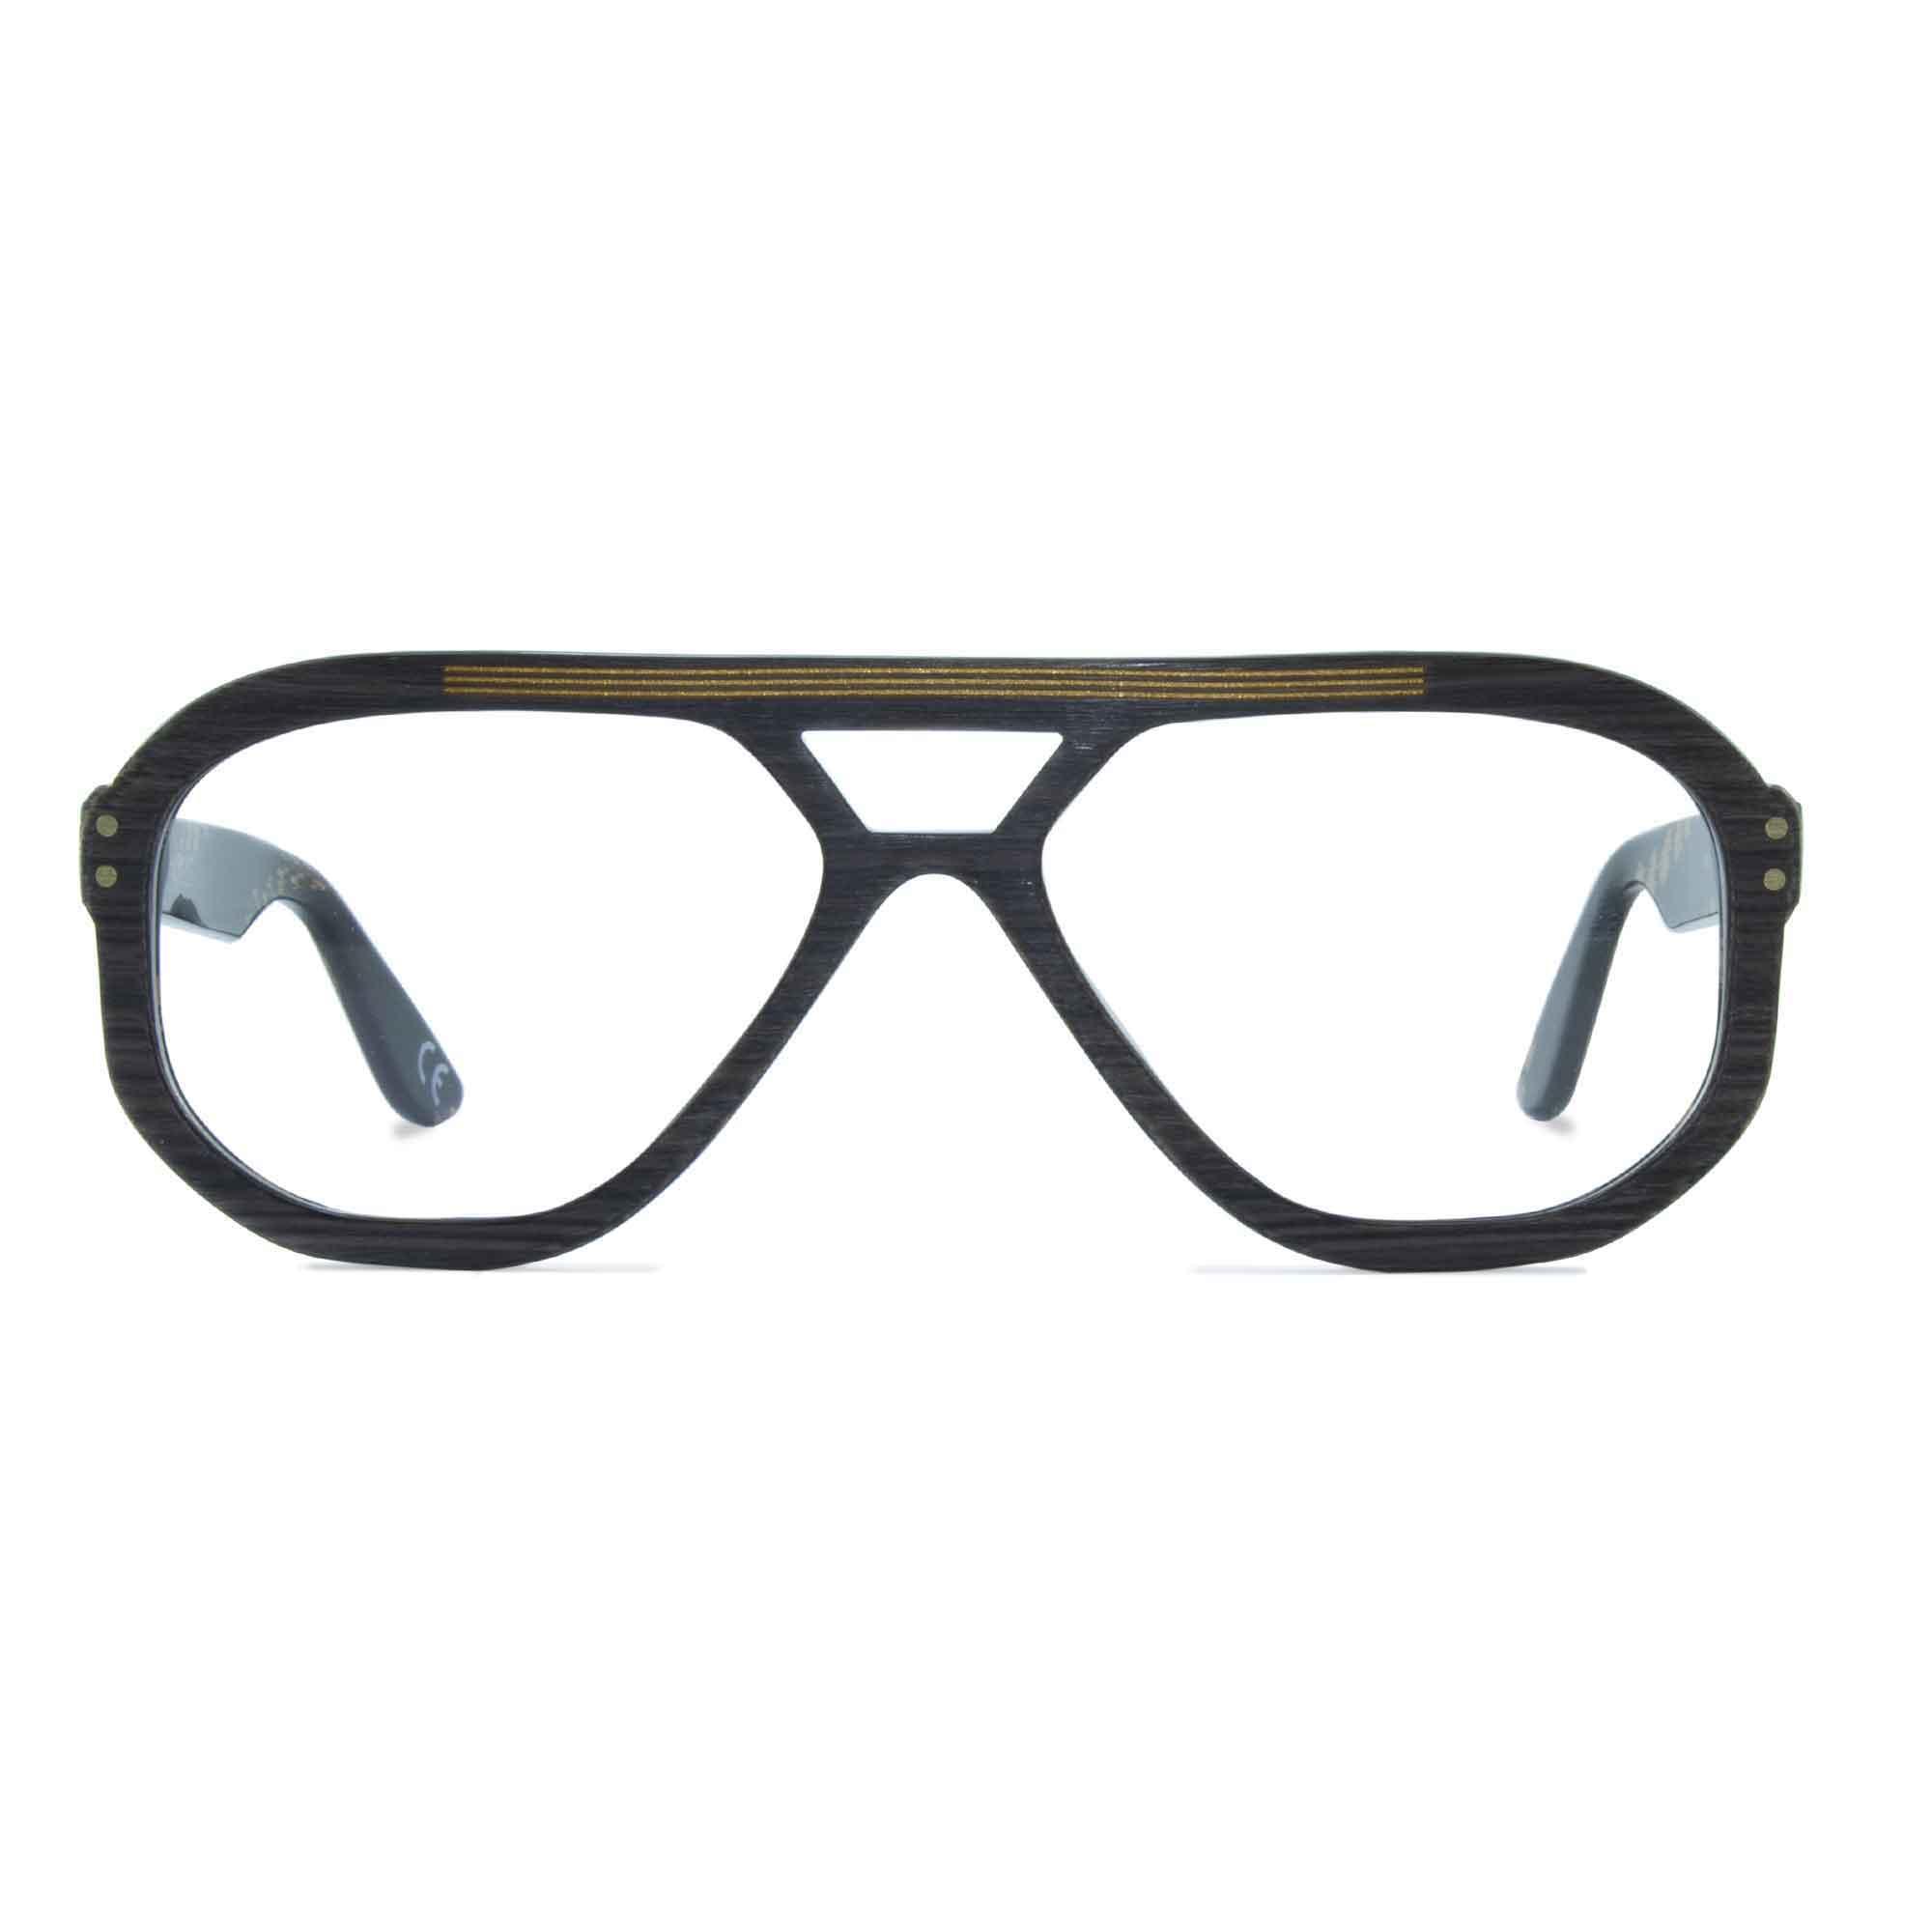 Joiuss jim dark wood navigator glasses